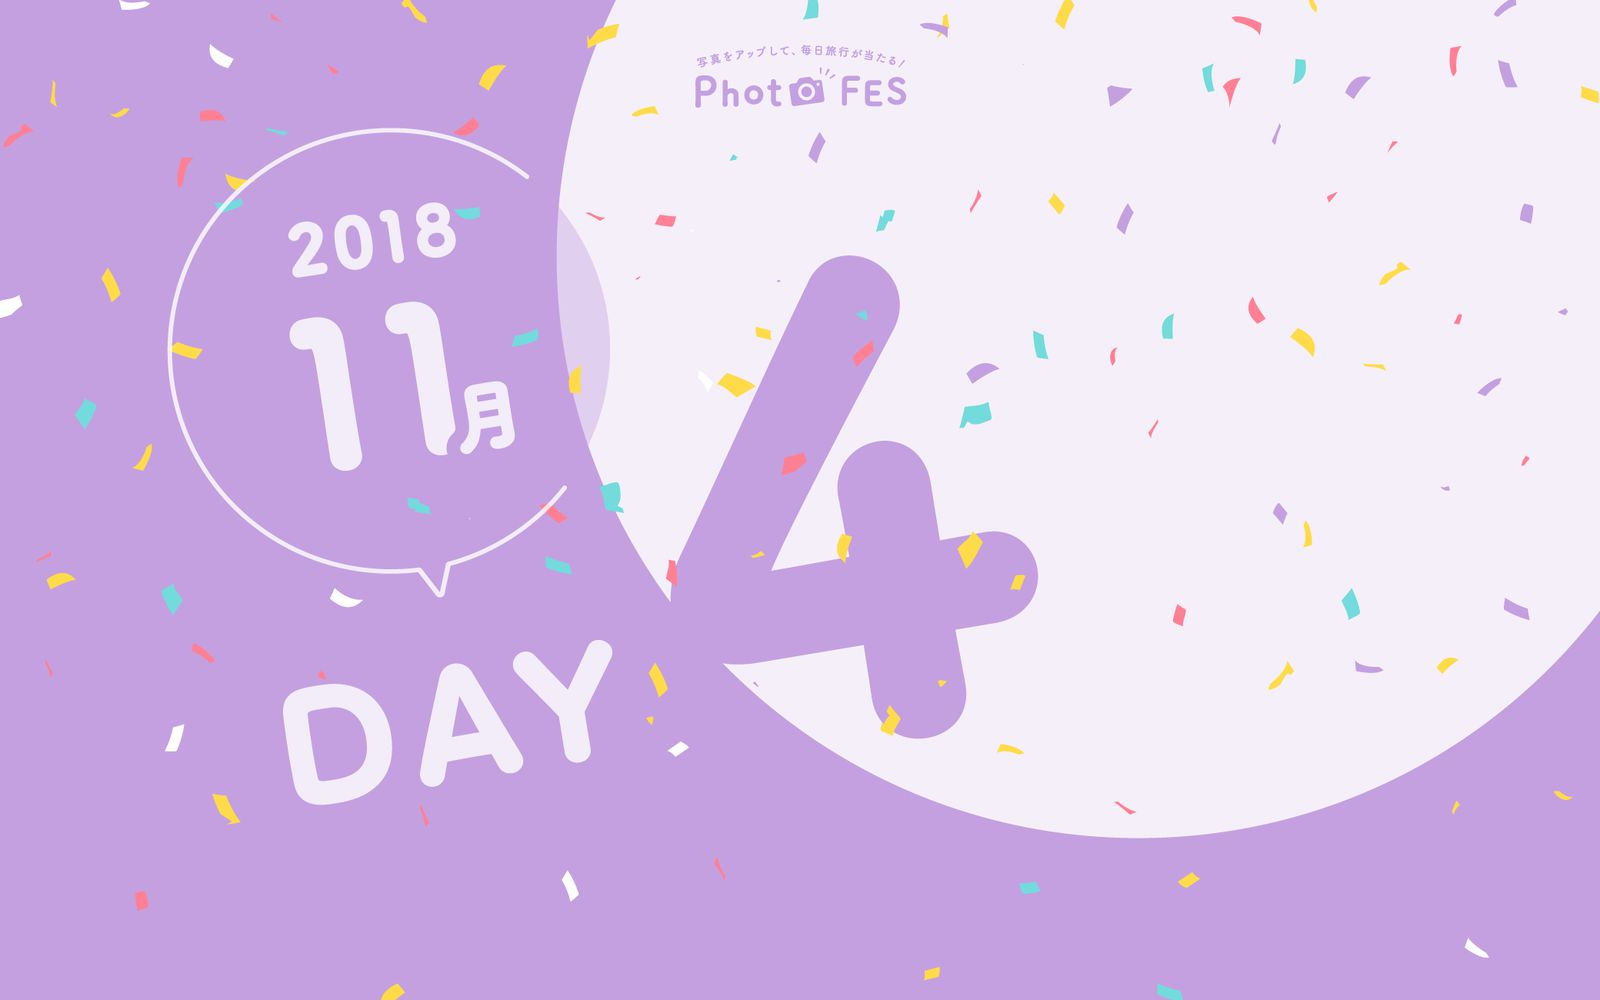 【DAY4】「Photo FES 2018 Autumn」11月4日投稿分であたる賞品&受賞者発表